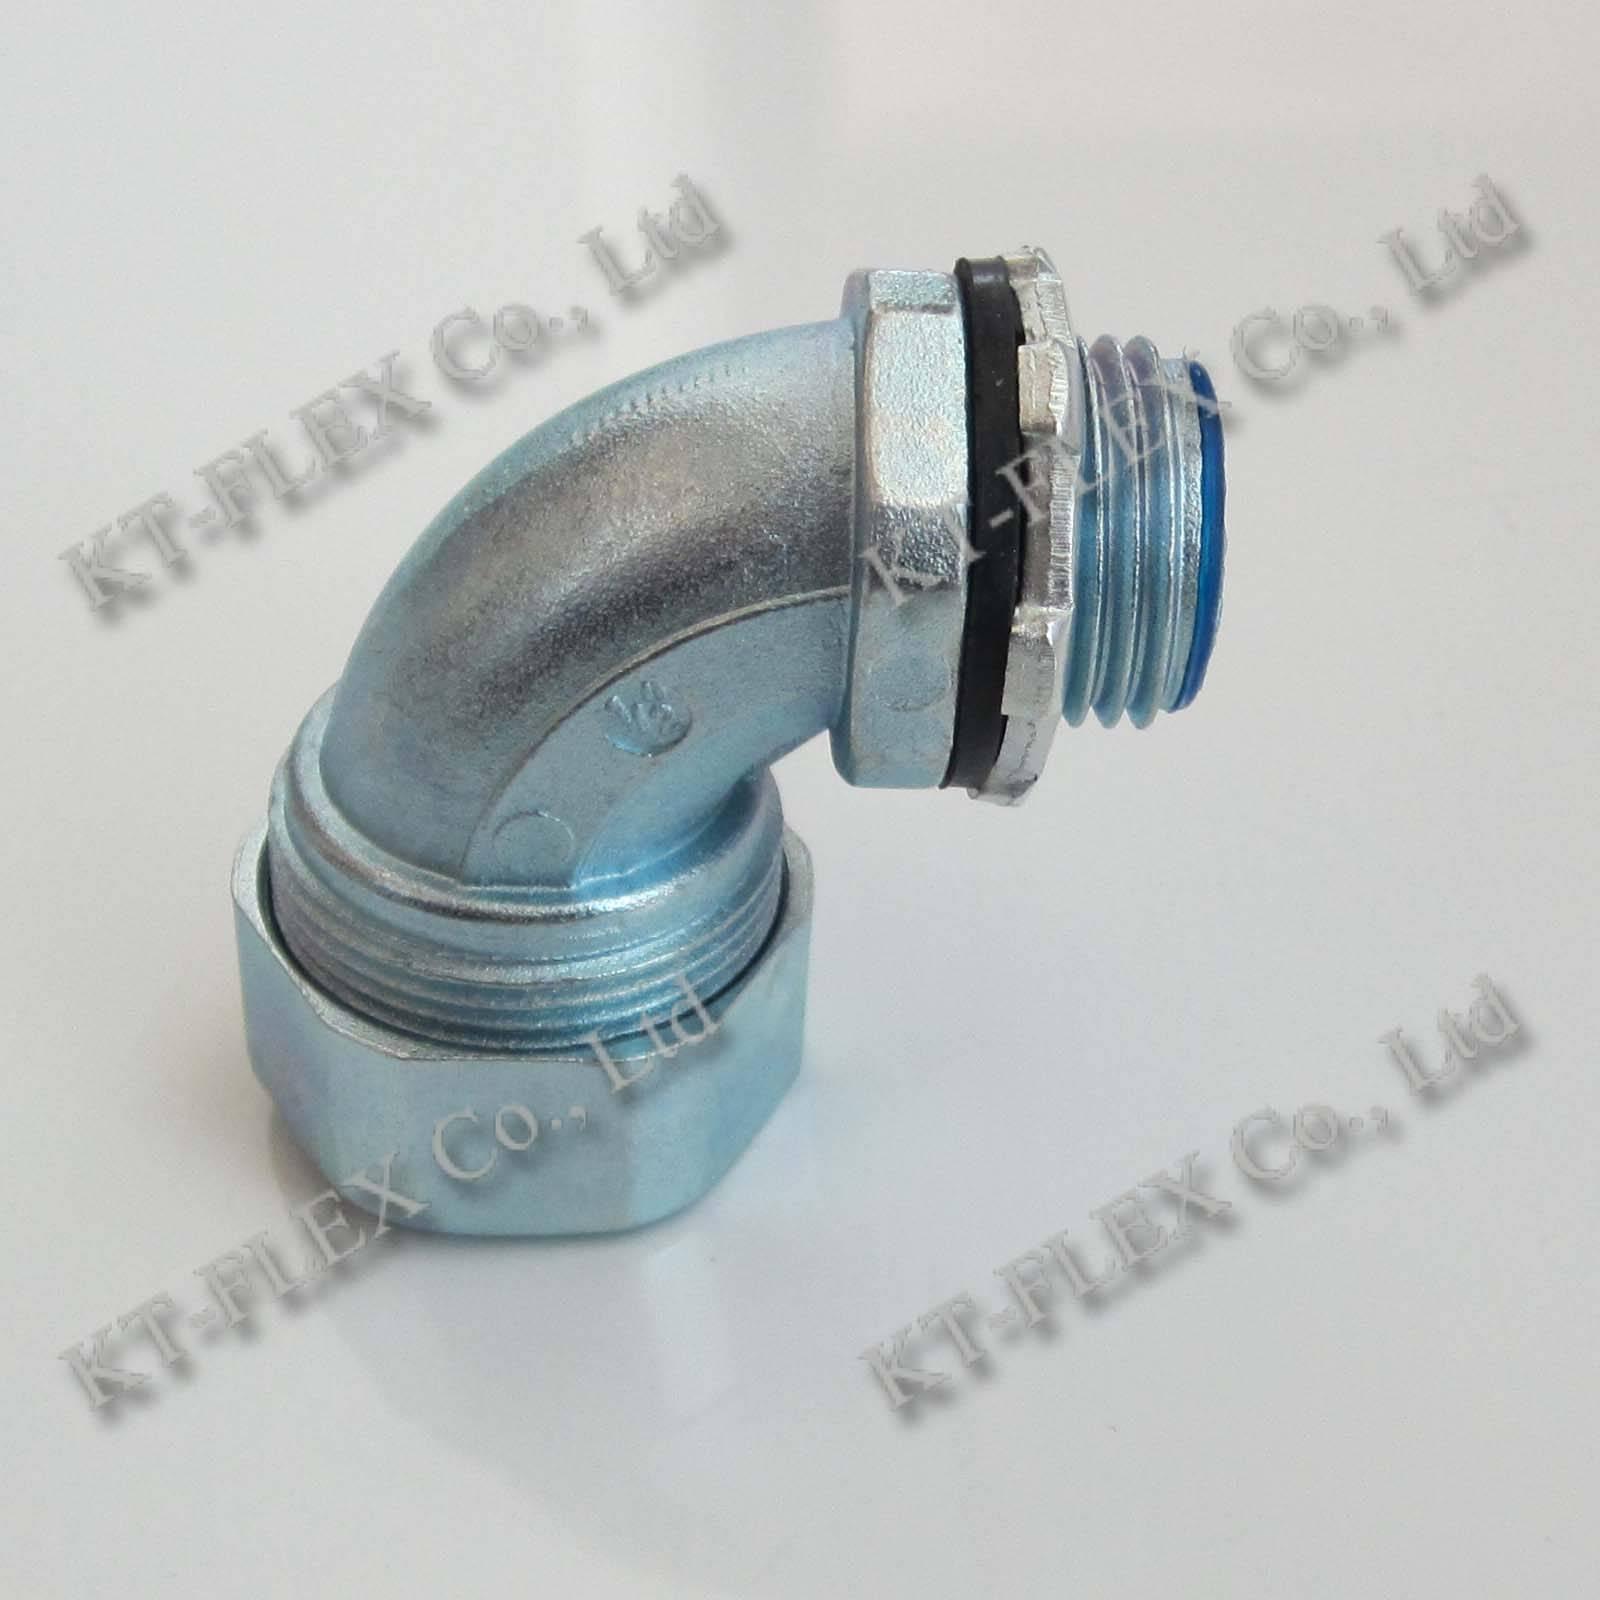 Waterproof Conduit Connector Electrical Metal Conduit Connectors